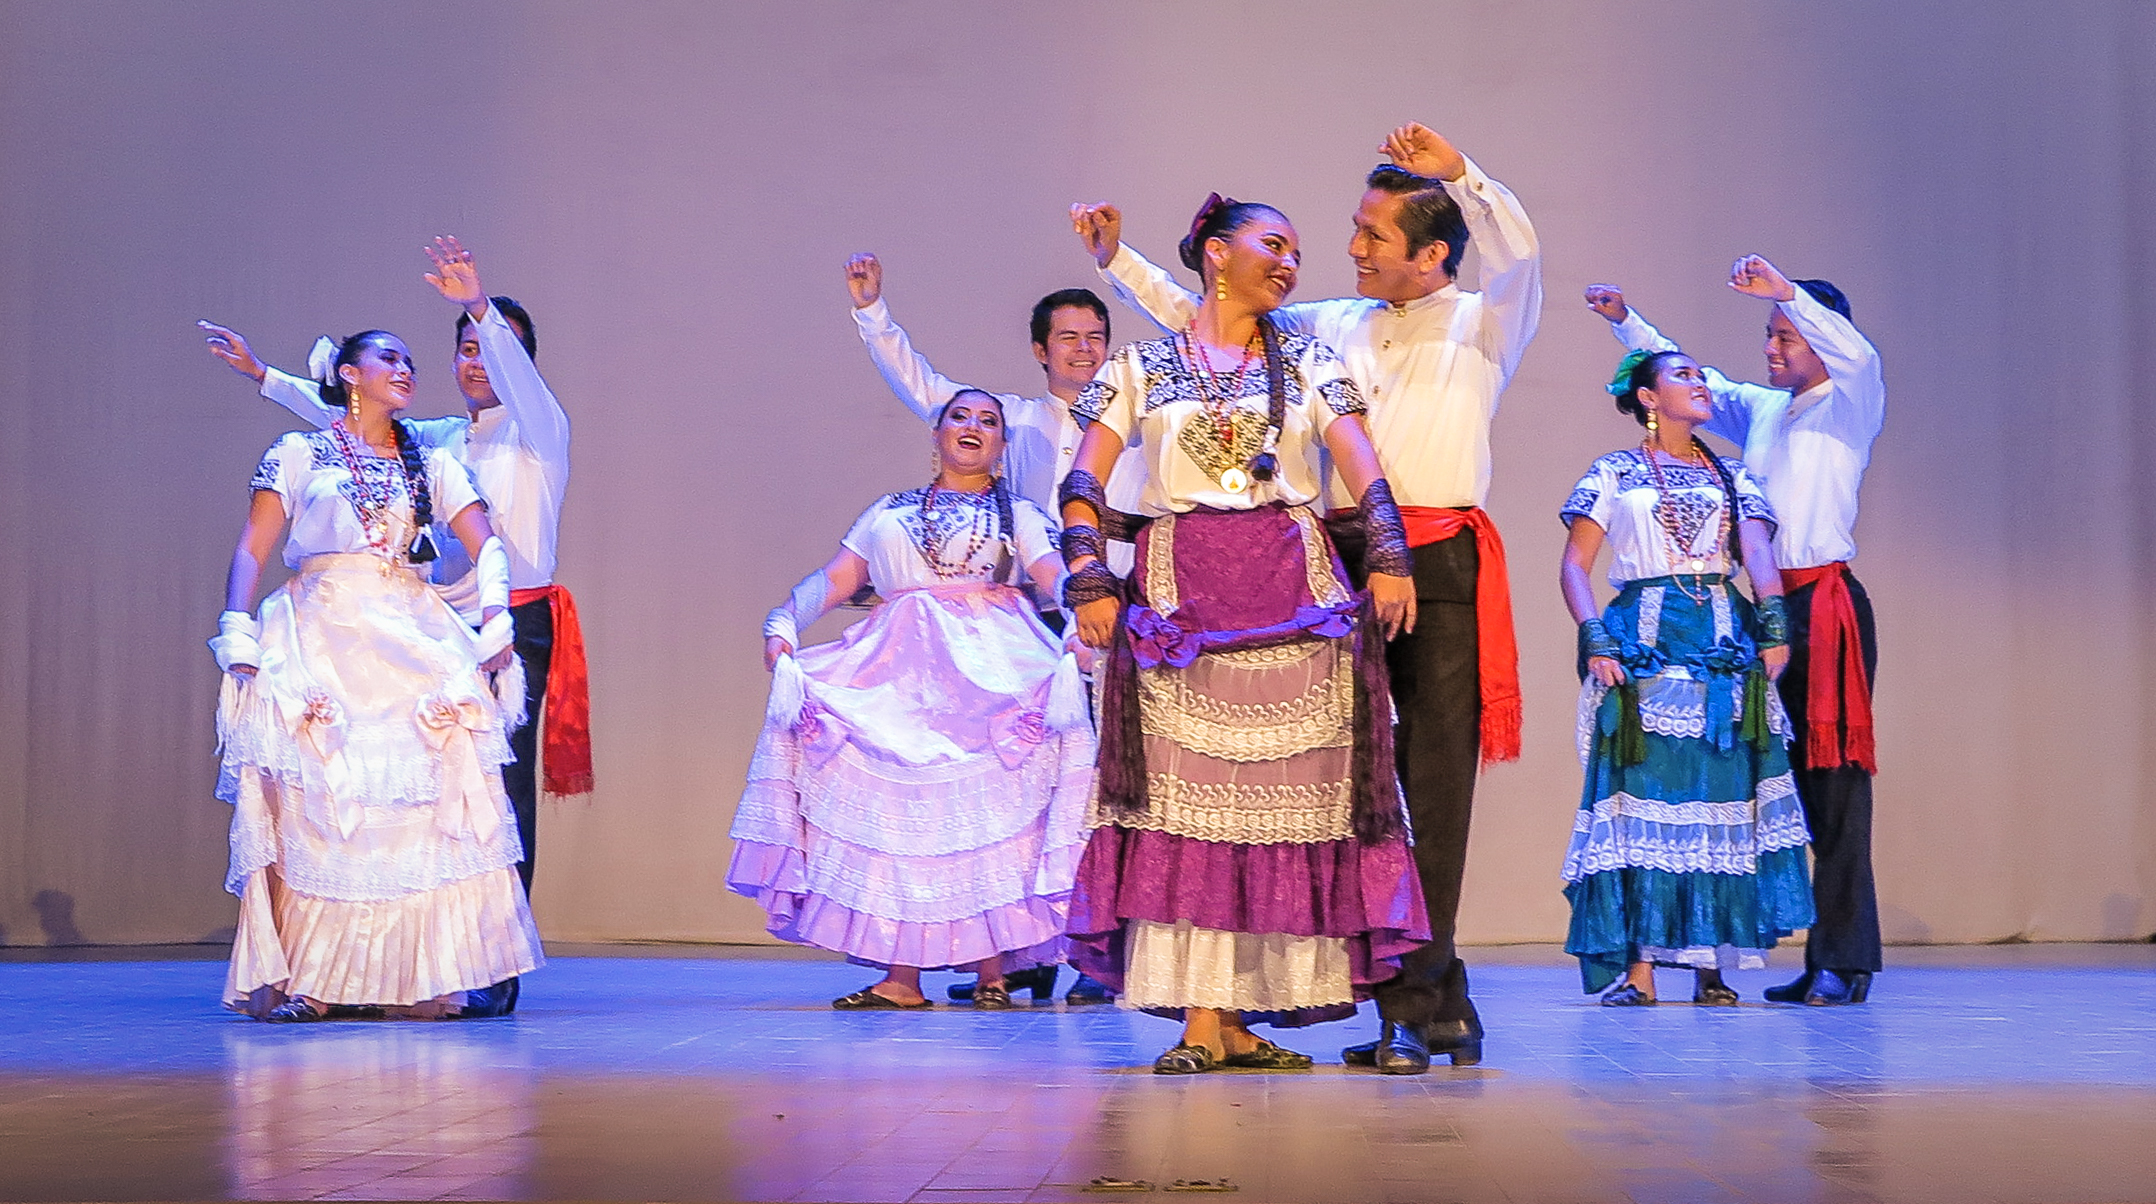 Campeche's magnificent Flamenco dancers,